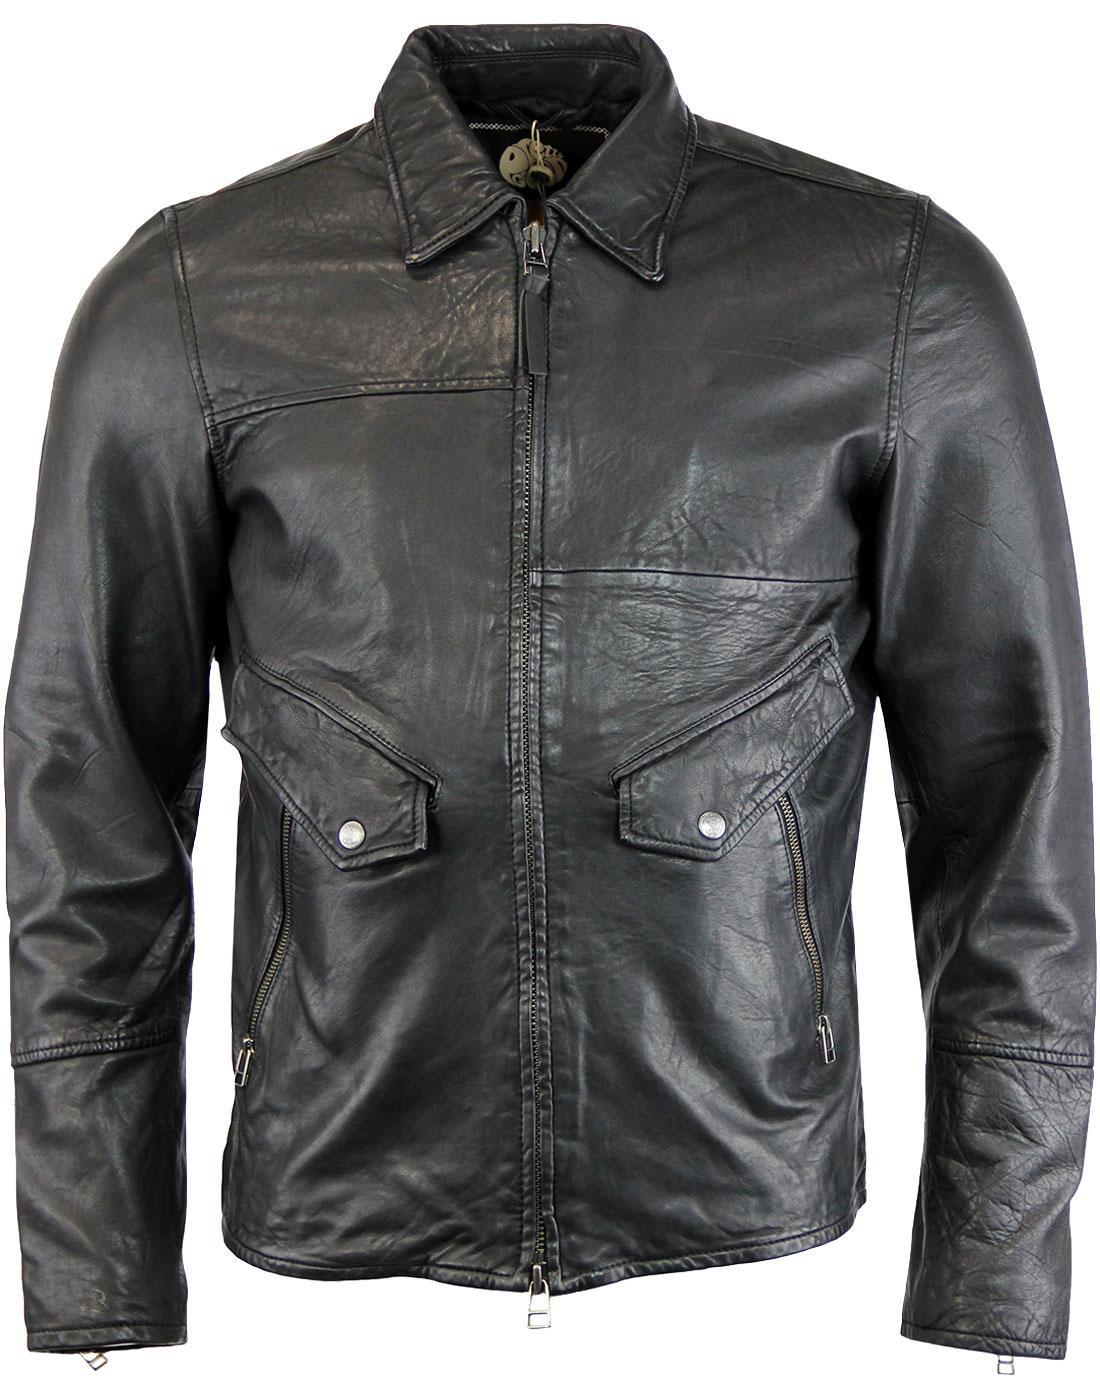 Jennets PRETTY GREEN Sixties Leather Jacket